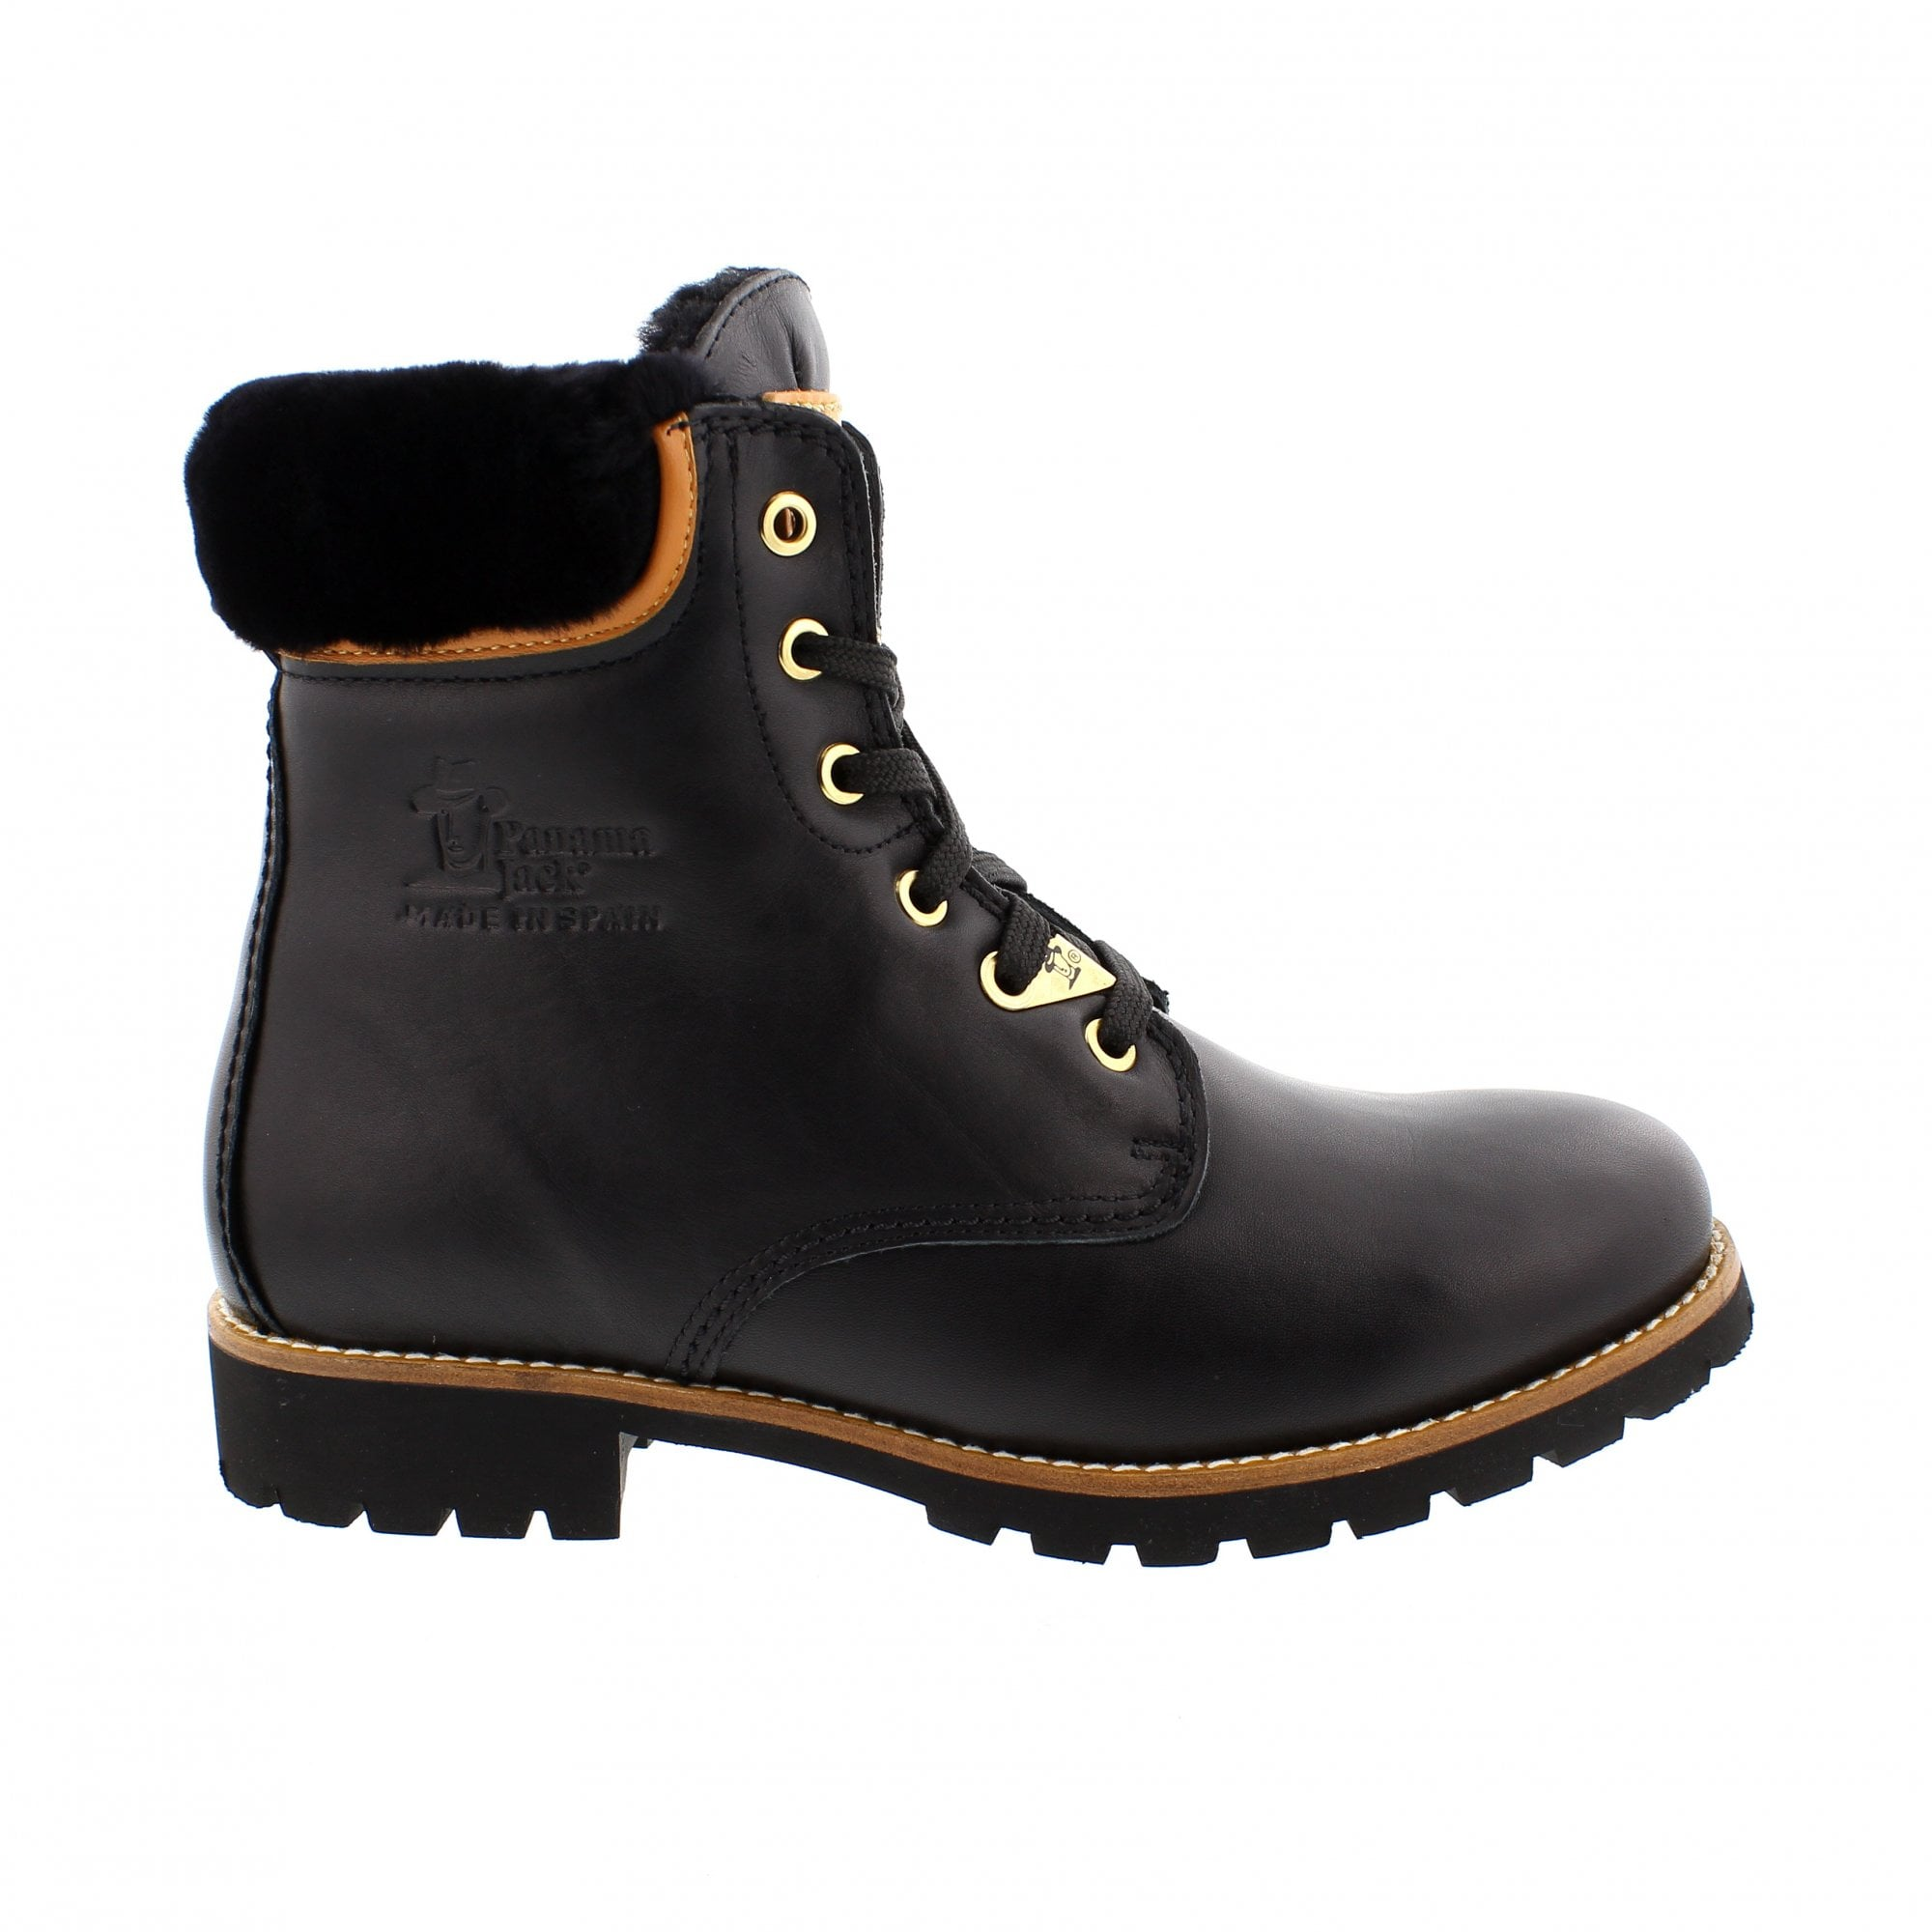 406af858ad881a Panama Jack 03 Igloo Travelling B2 Napa Womens Ankle Boots ...